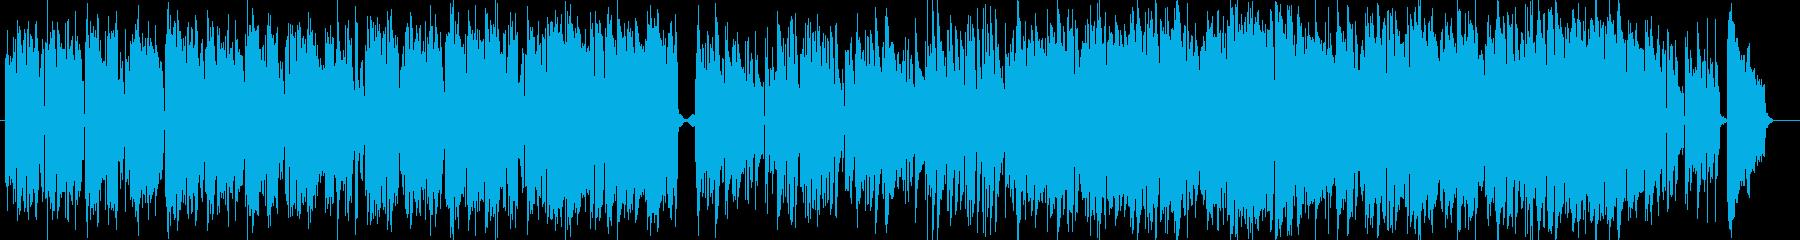 Accordion is fashionable Bossa Nova's reproduced waveform